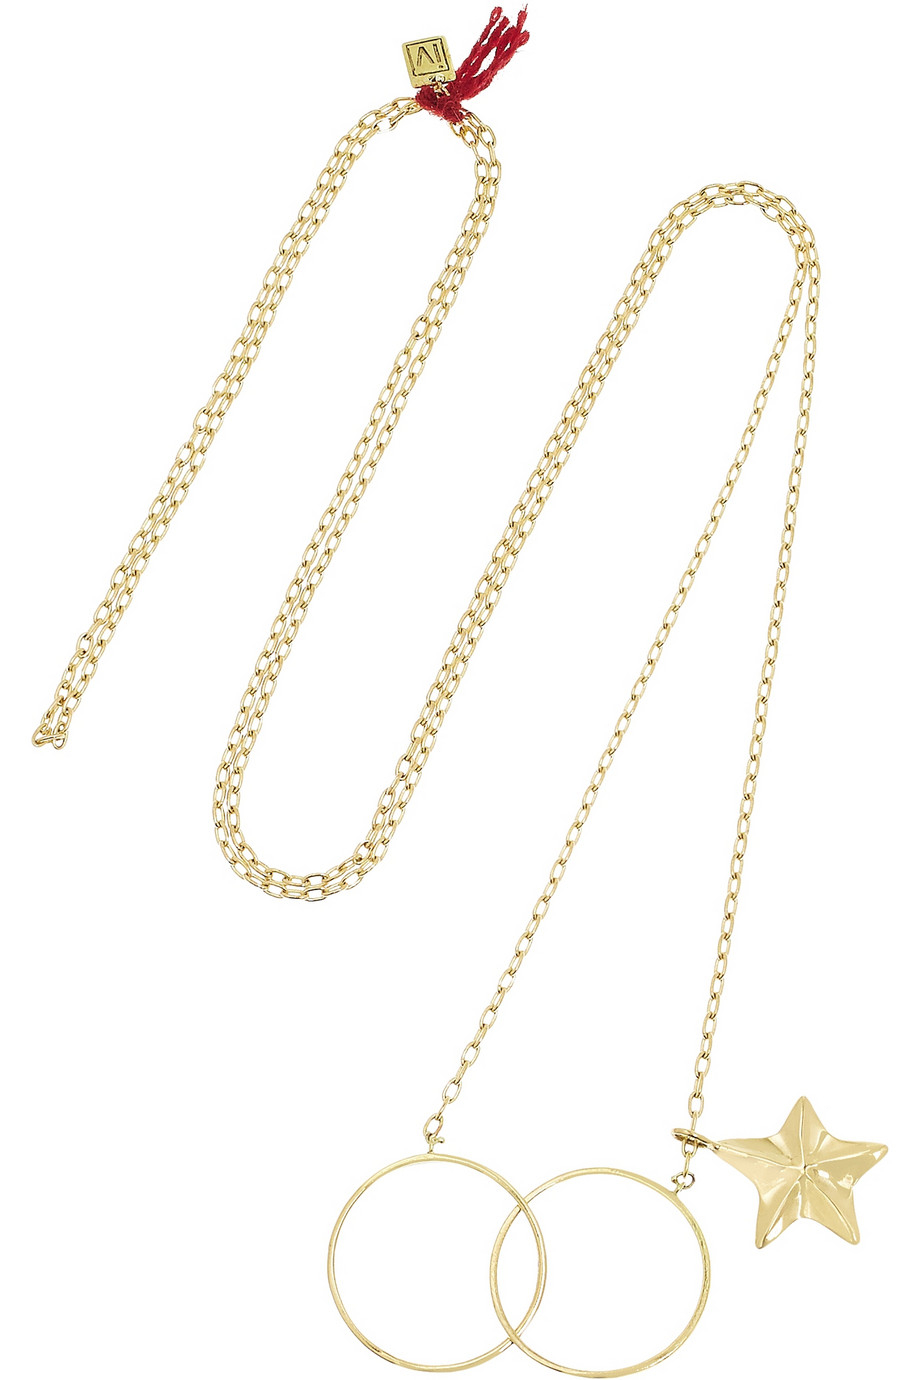 Colier din aur, Inez and Vinoodh, net-a-porter.com, 3.720 euro